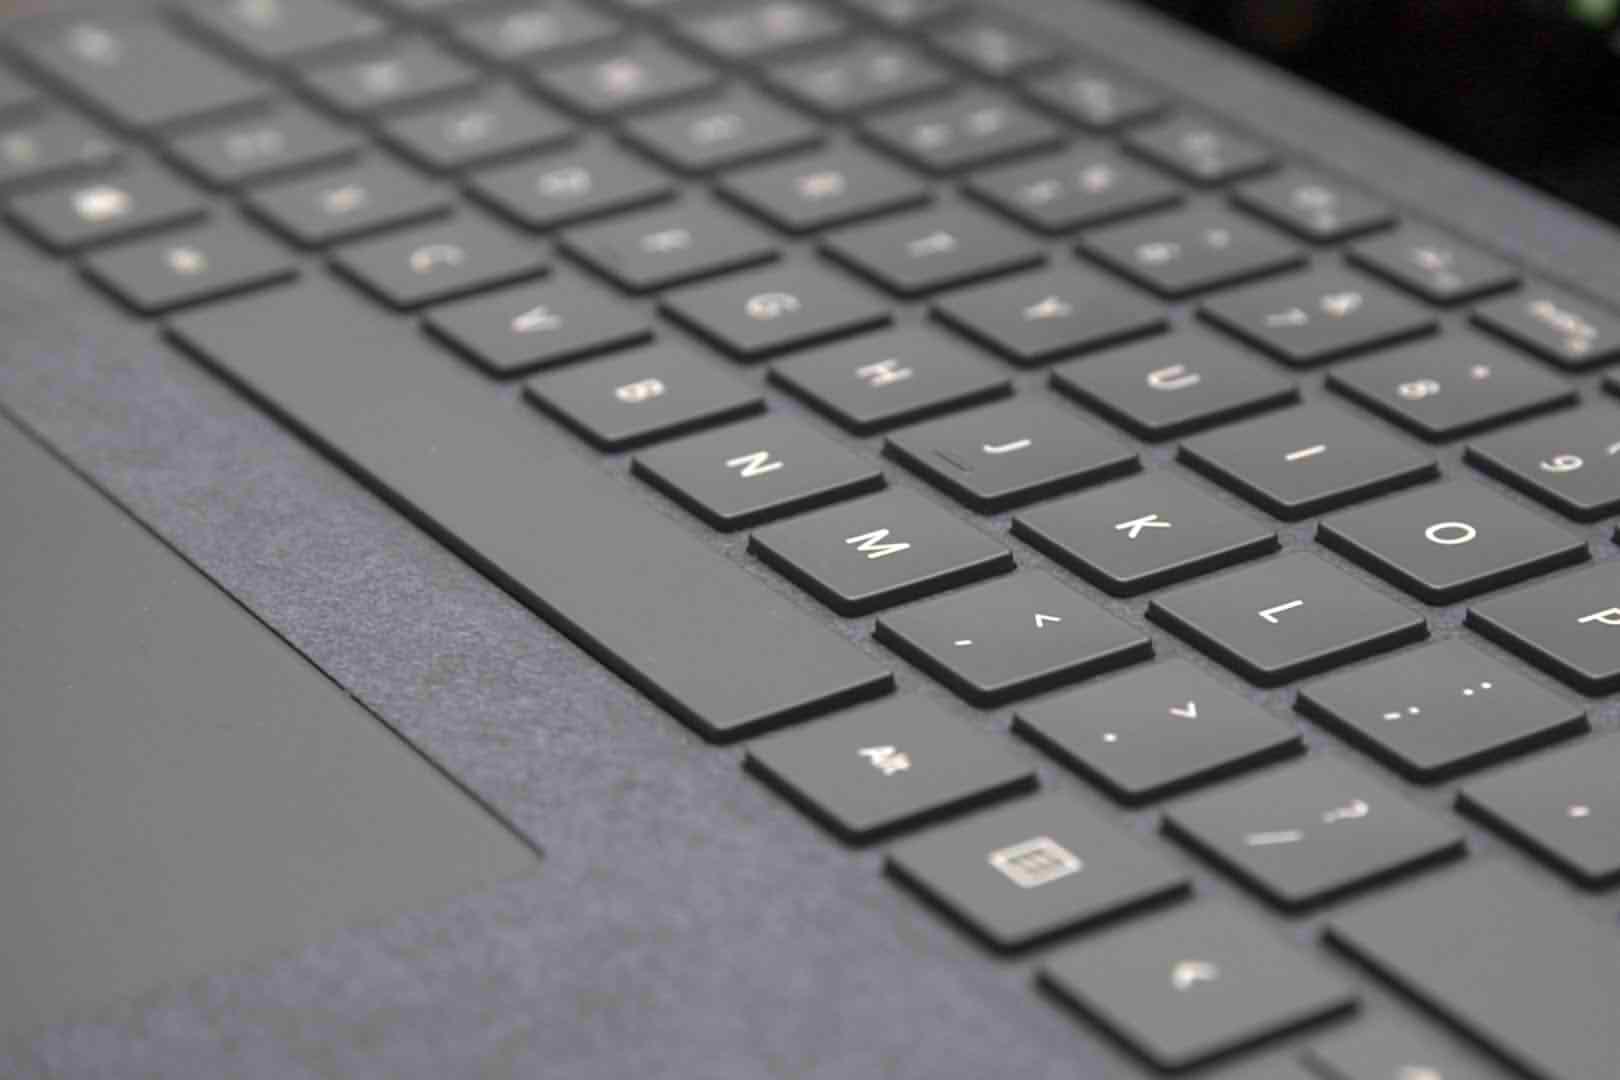 کیبورد مایکروسافت سرفیس پرو 4 مدل type cover